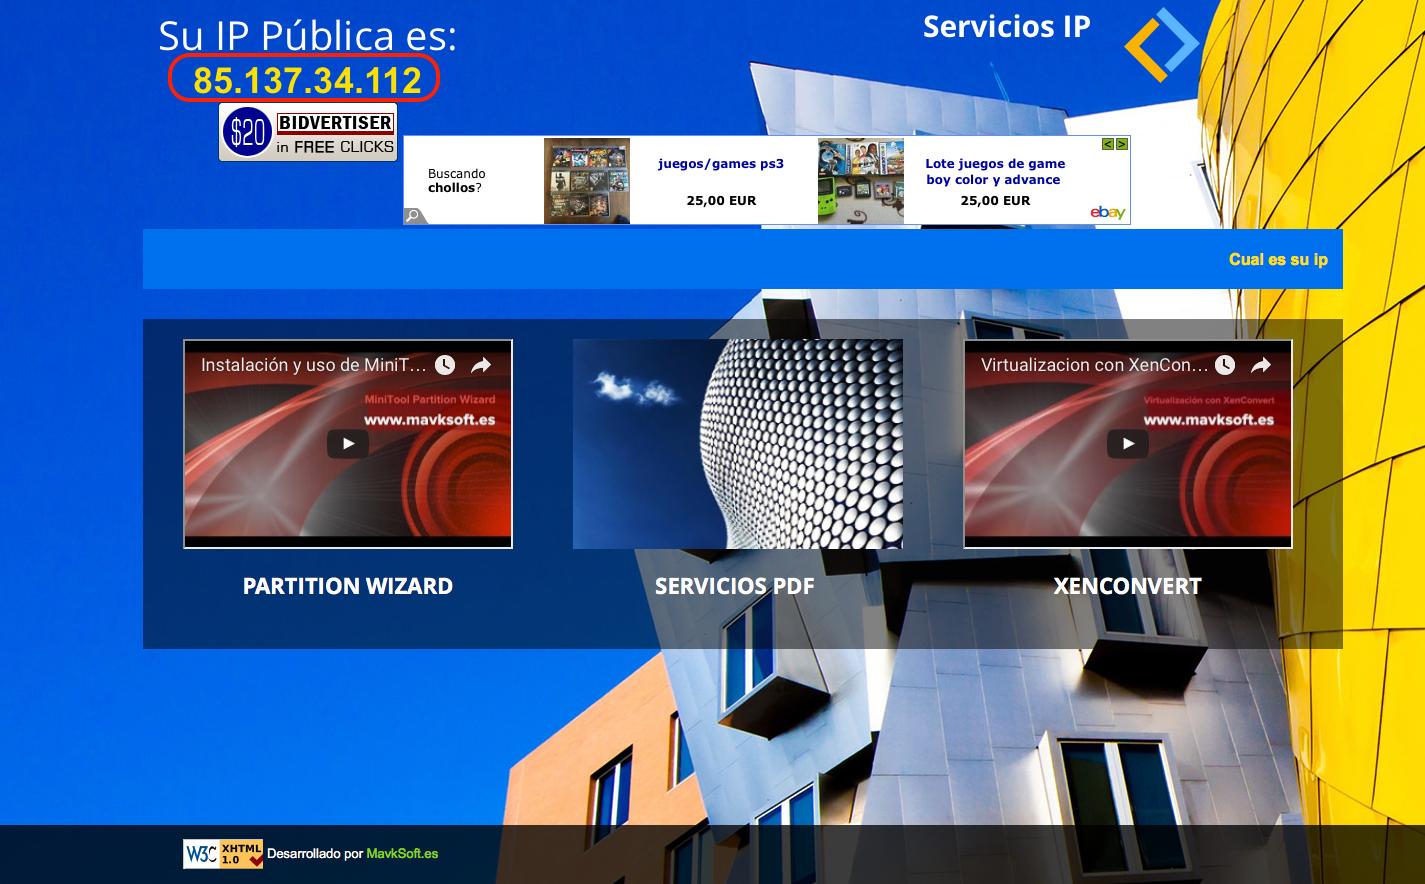 Web conoce-tu-ip.com